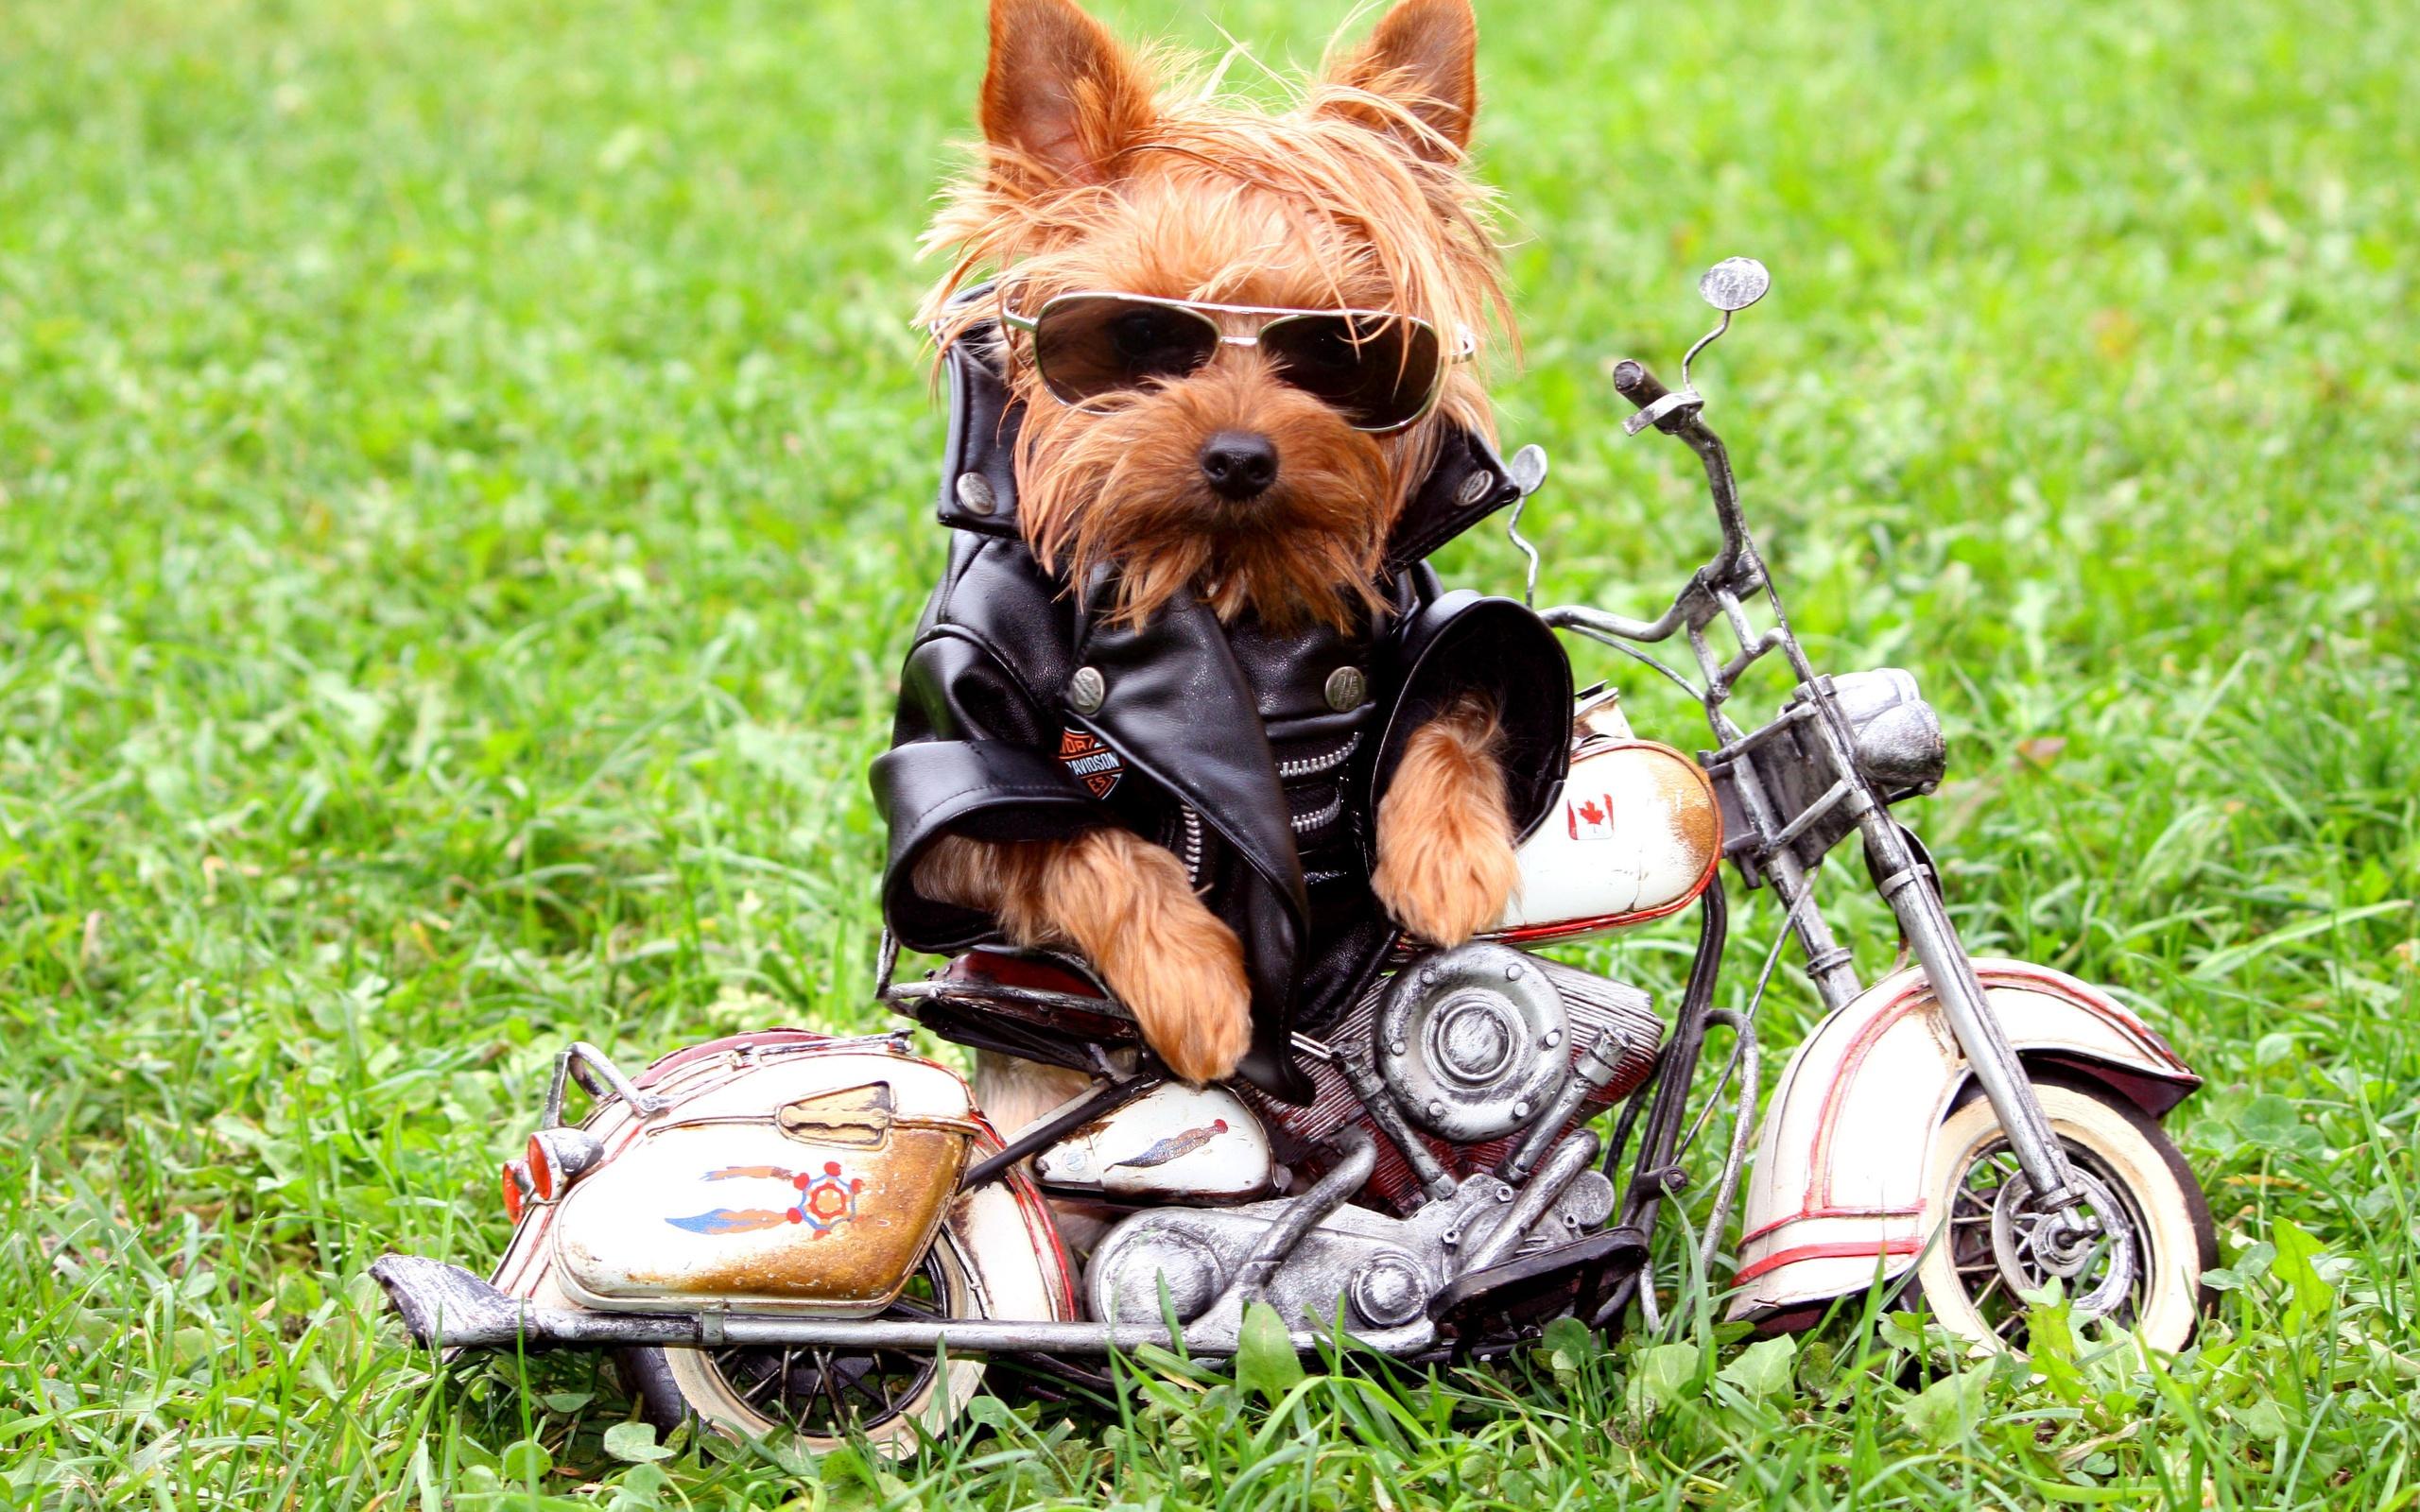 Funny biker dog